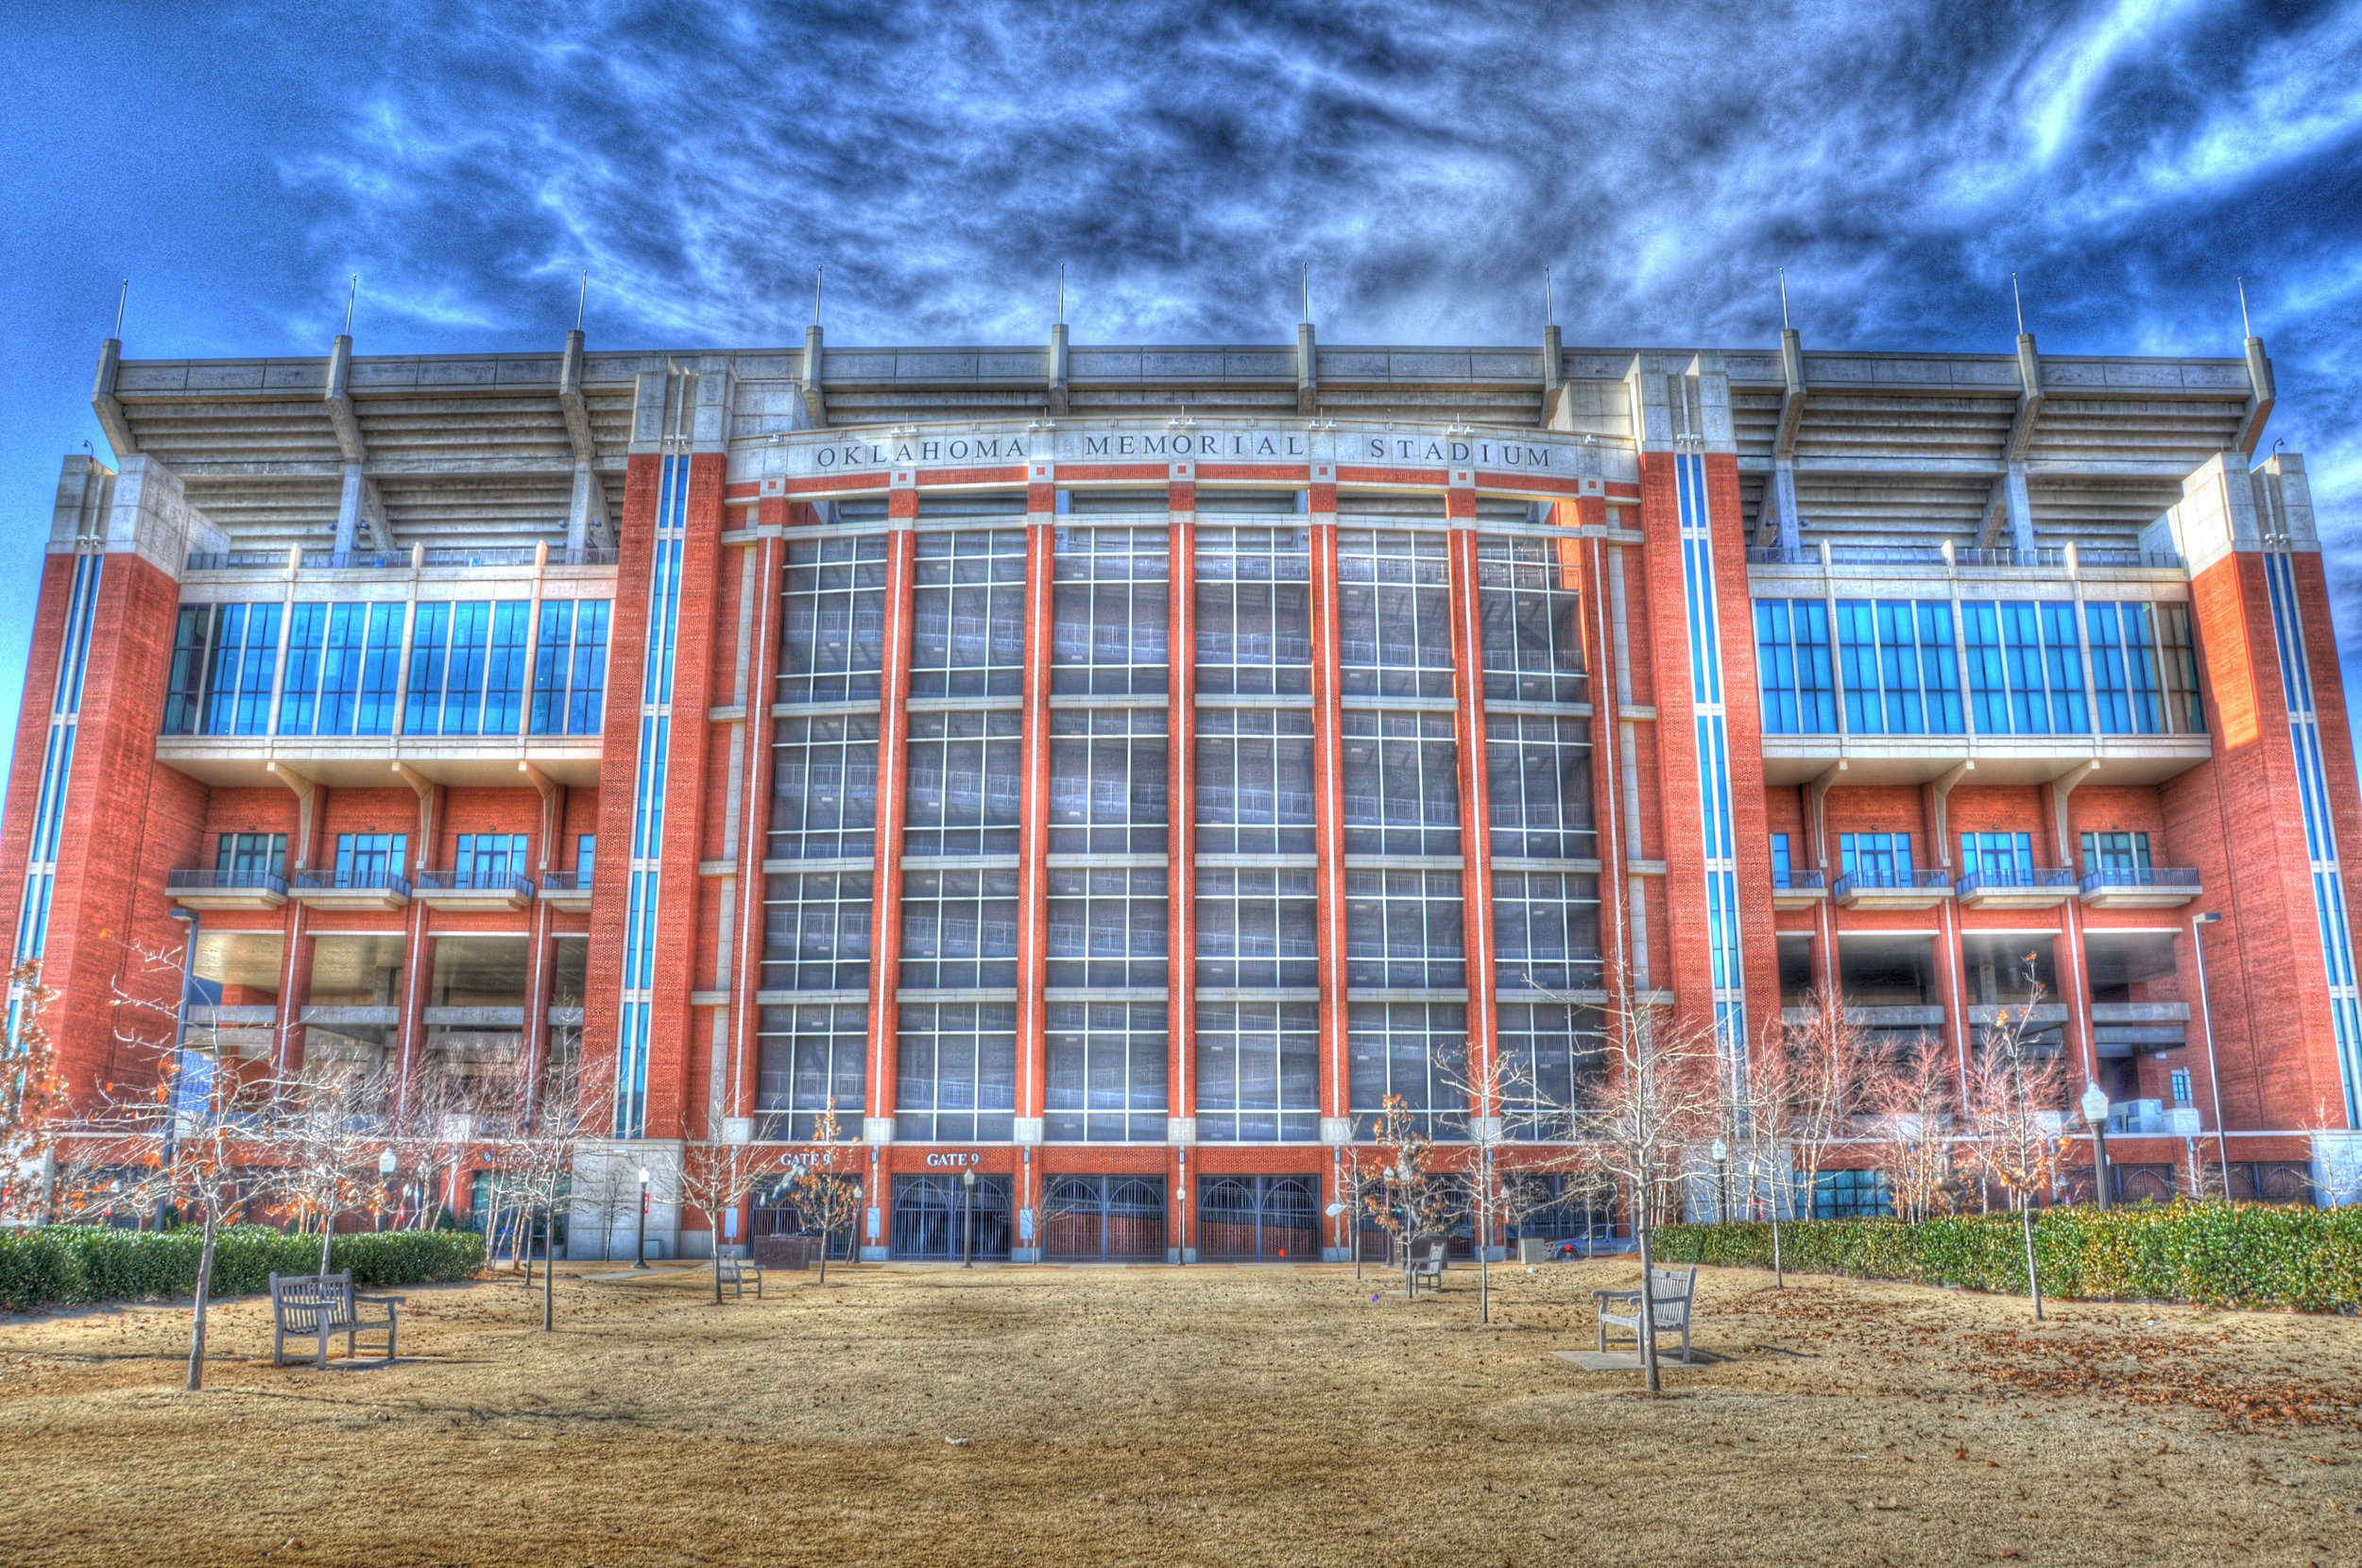 Oklahoma-Memorial-Stadium-HDR-Large.jpg